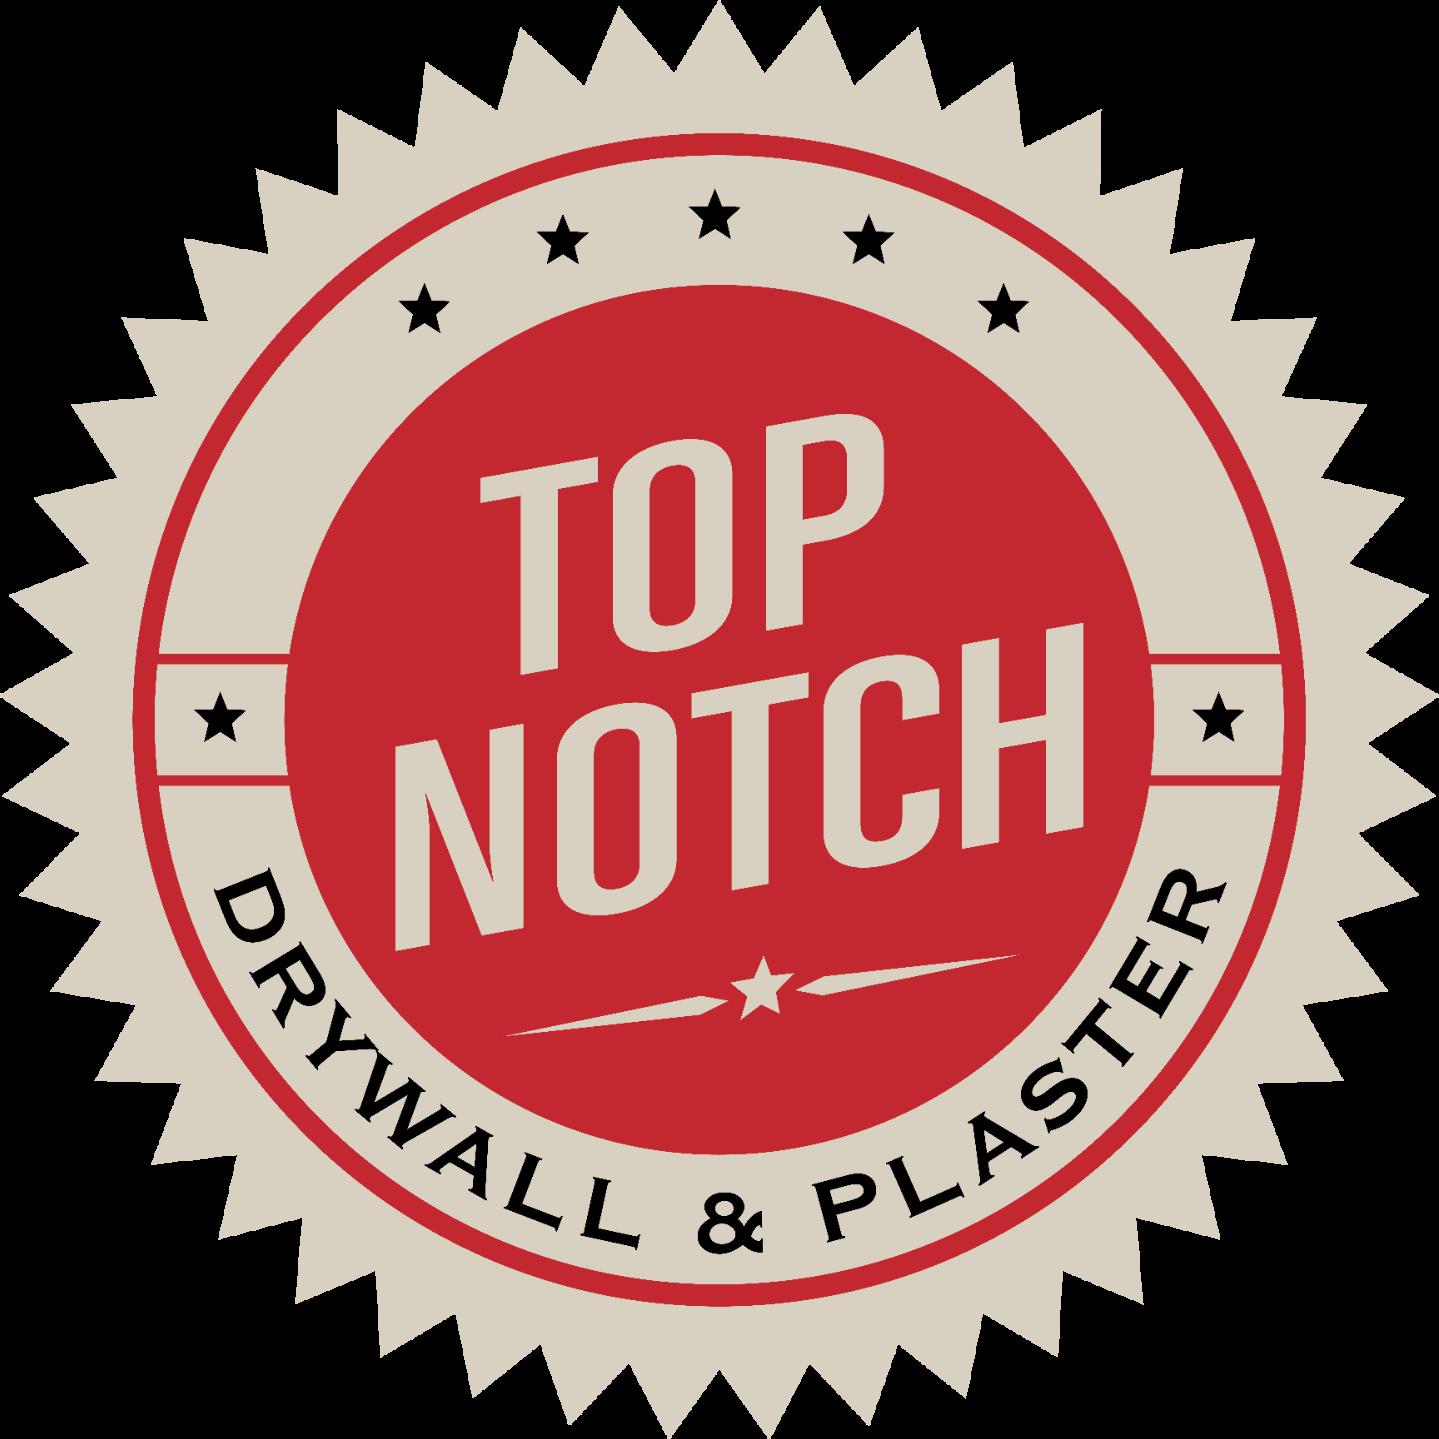 Top Notch Drywall & Plaster logo